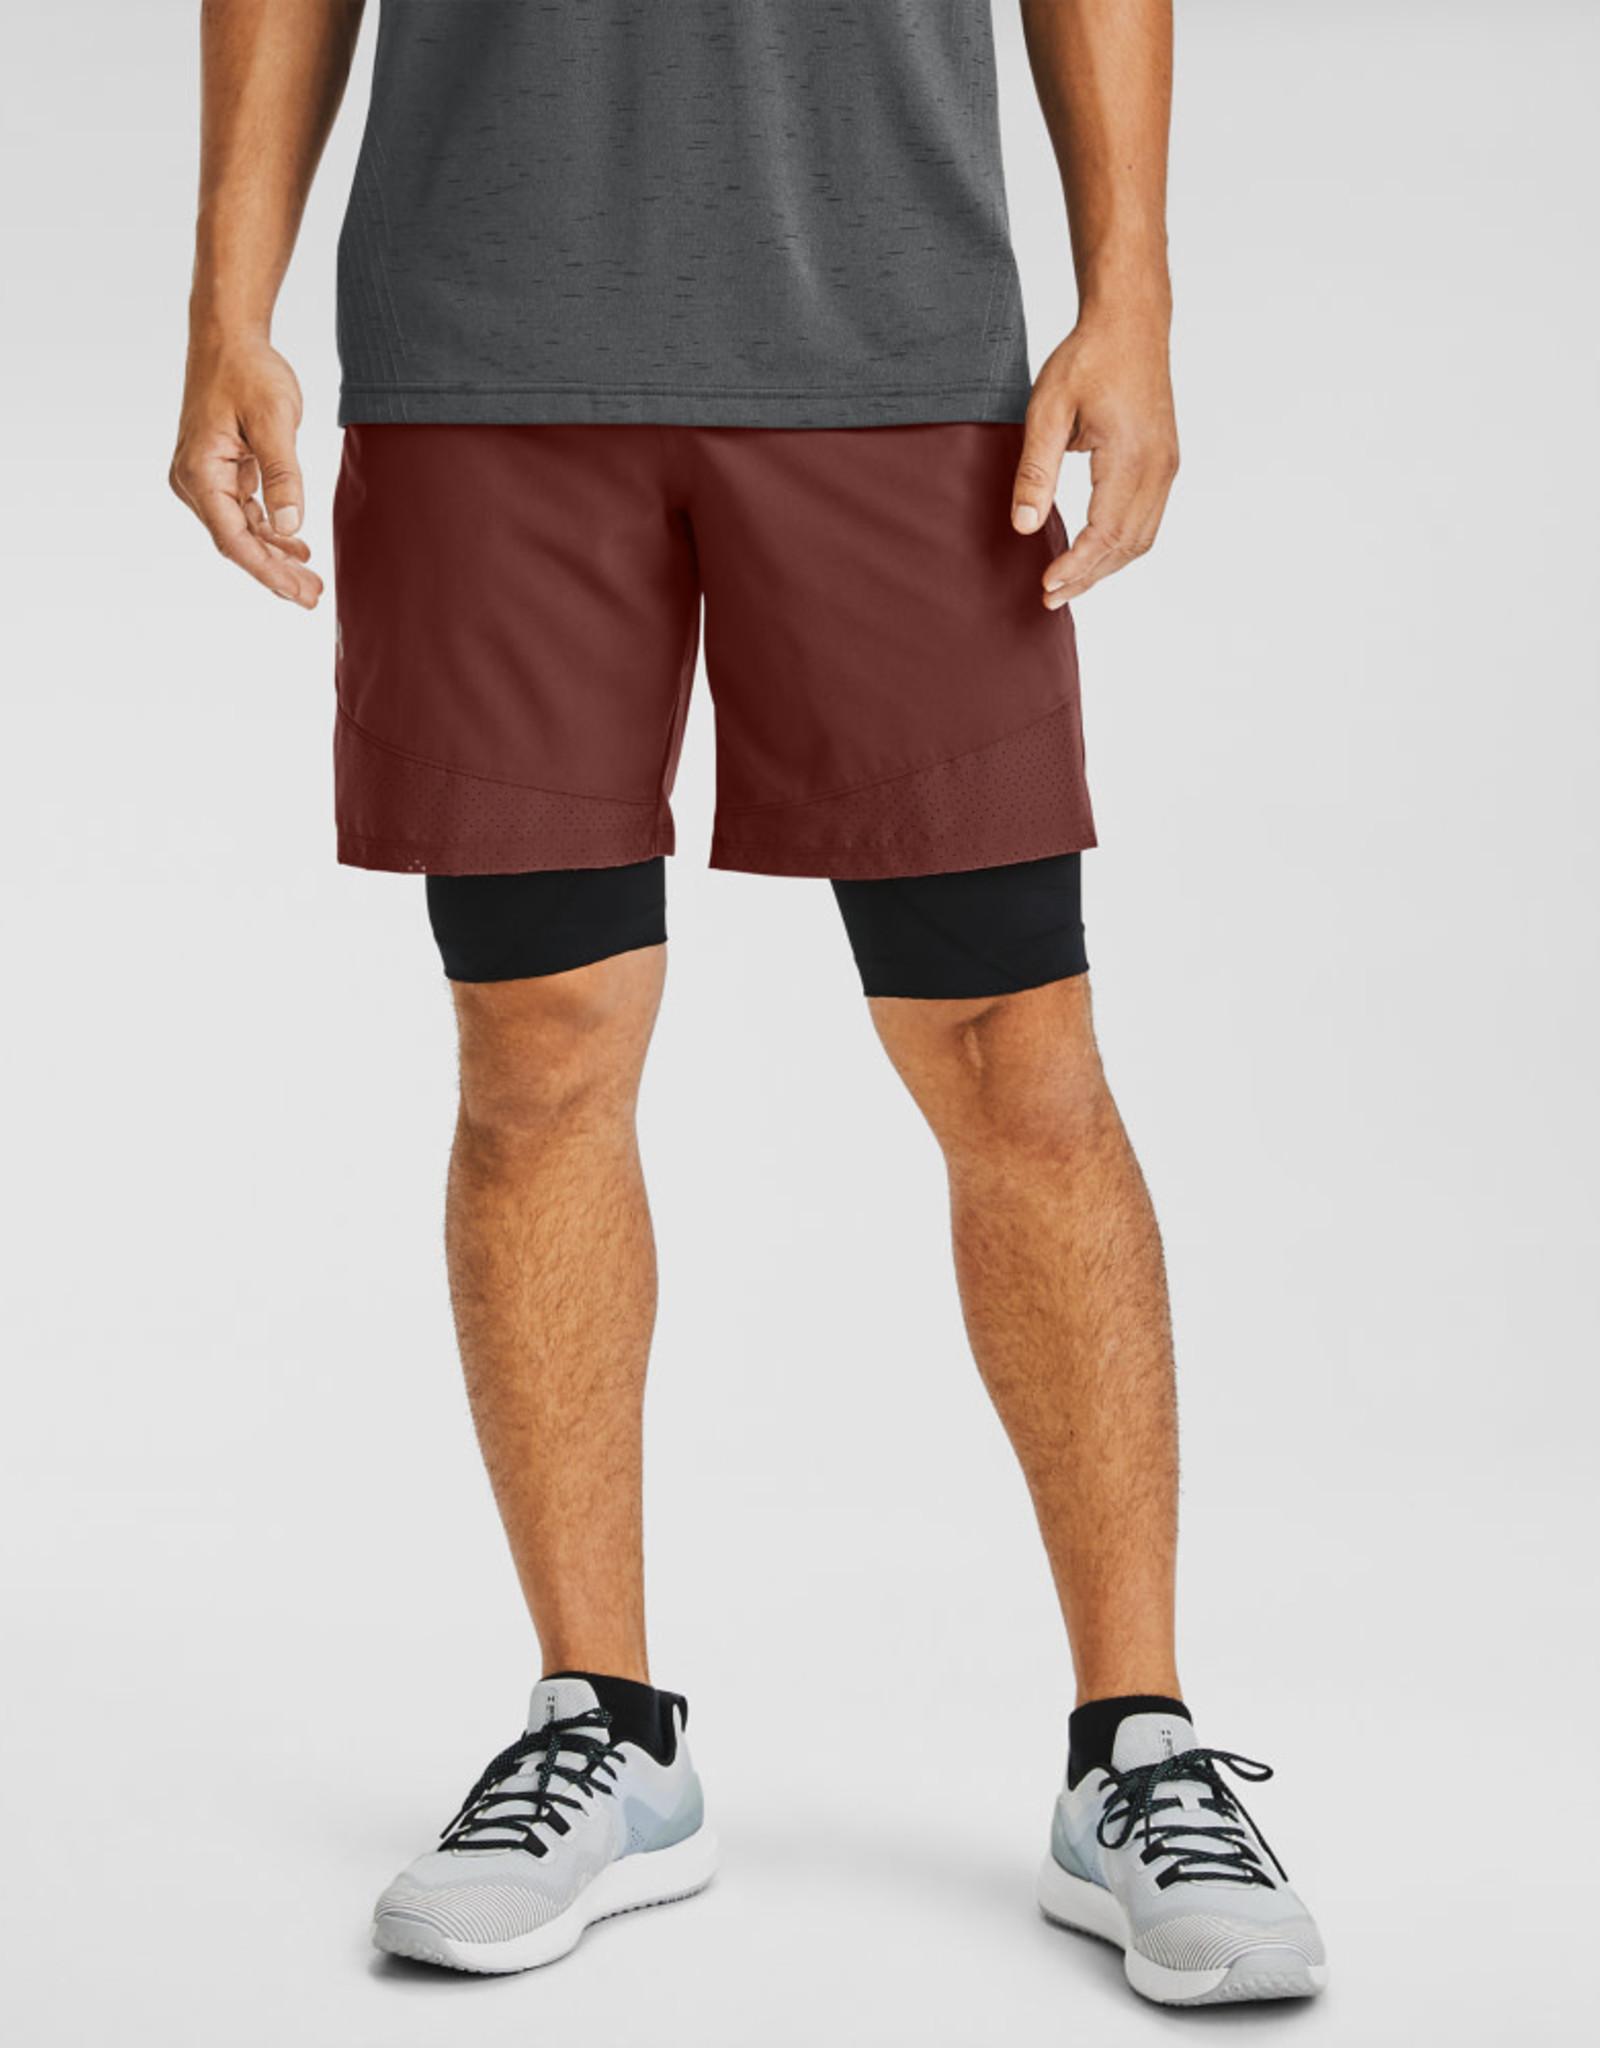 Under Armour UA Vanish Woven Shorts - Cinna Red--Black